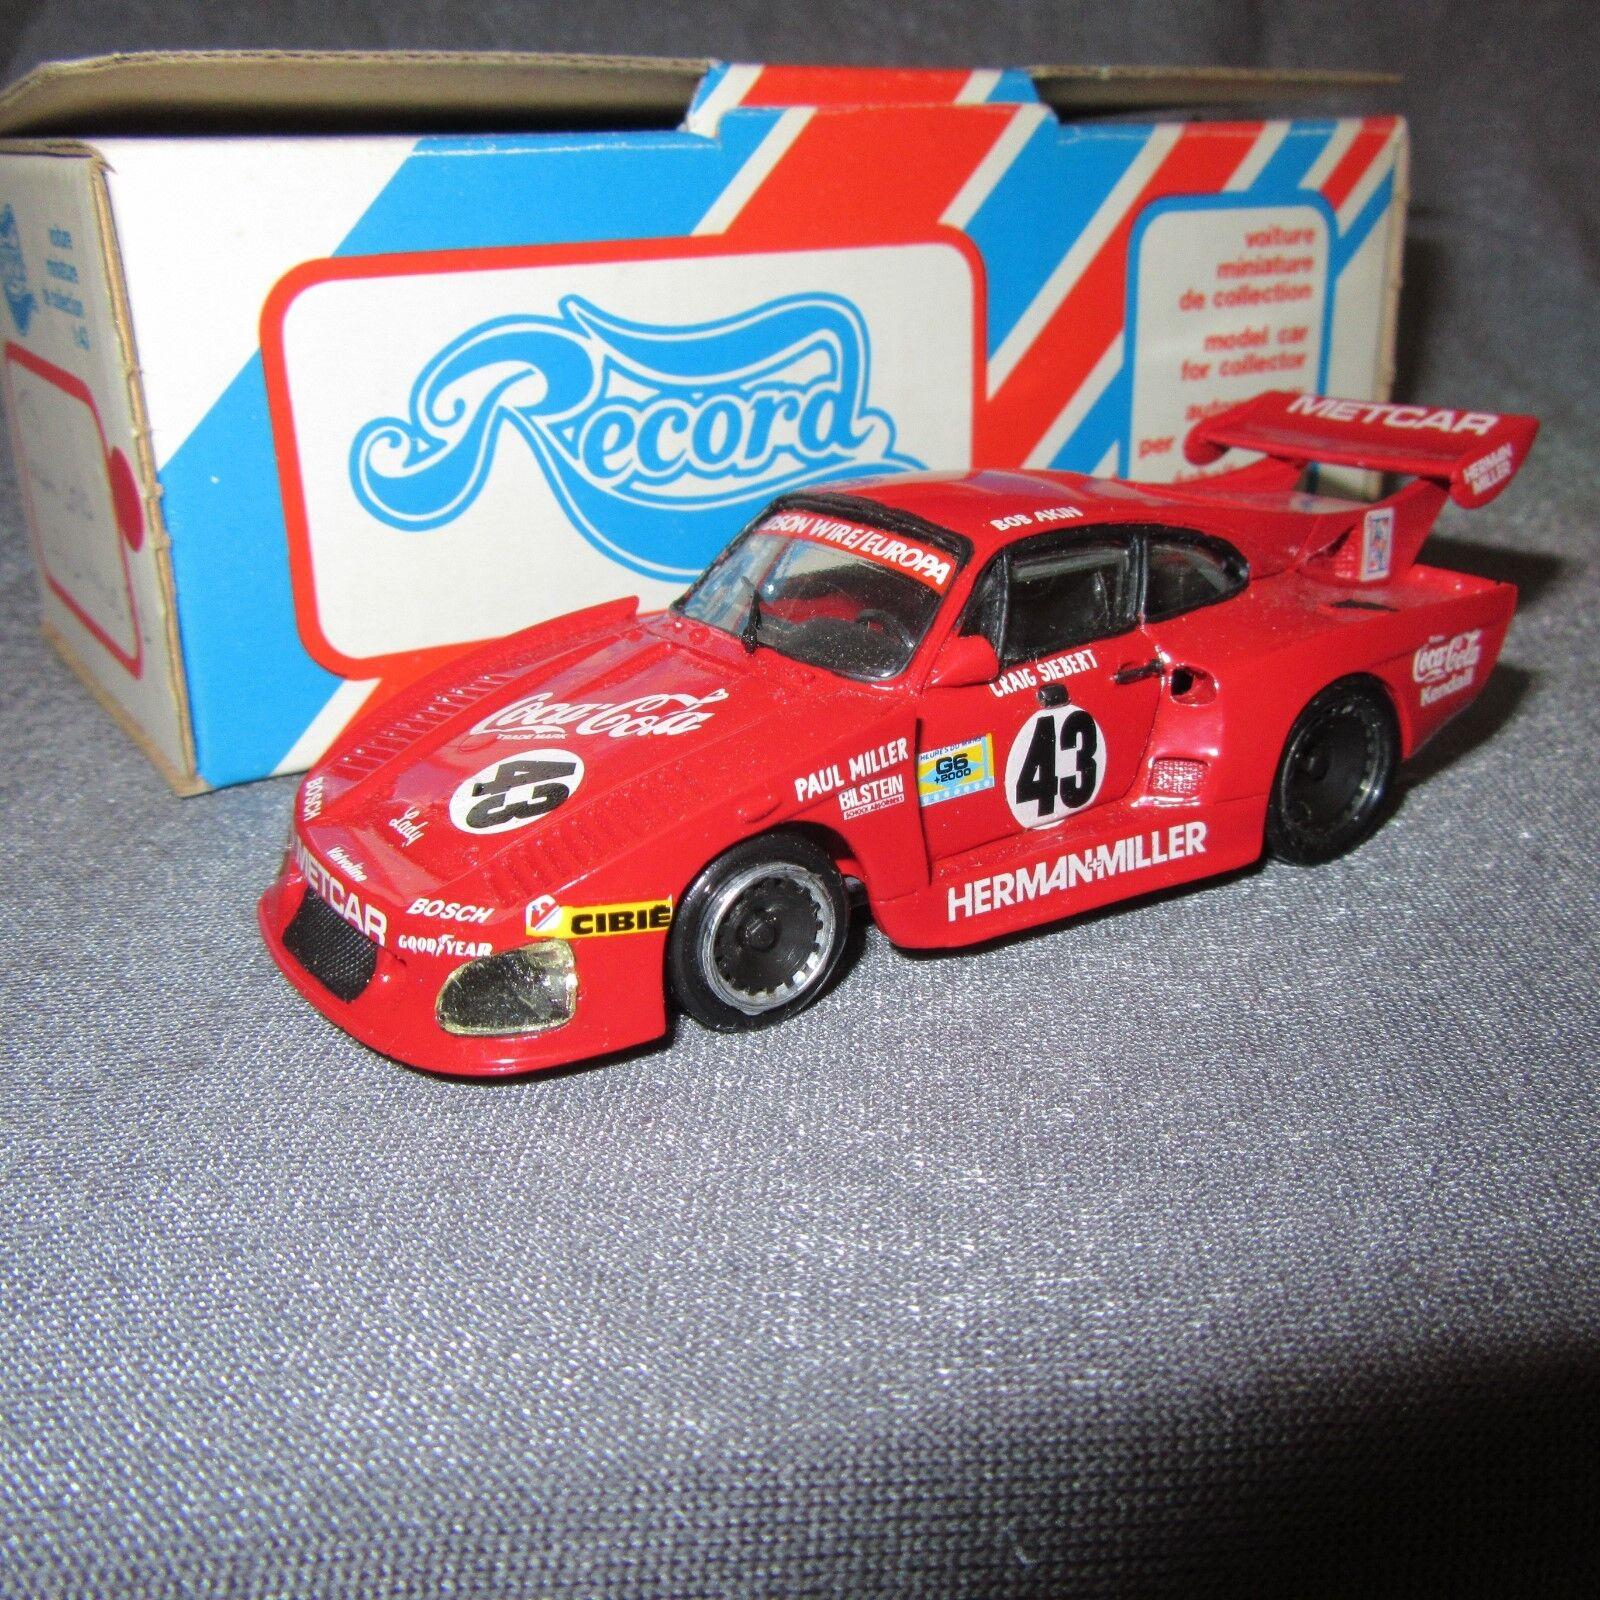 78F Record Porsche 935 Turbo K3 LM 1981   43 Akin 1 43 Kit Résine